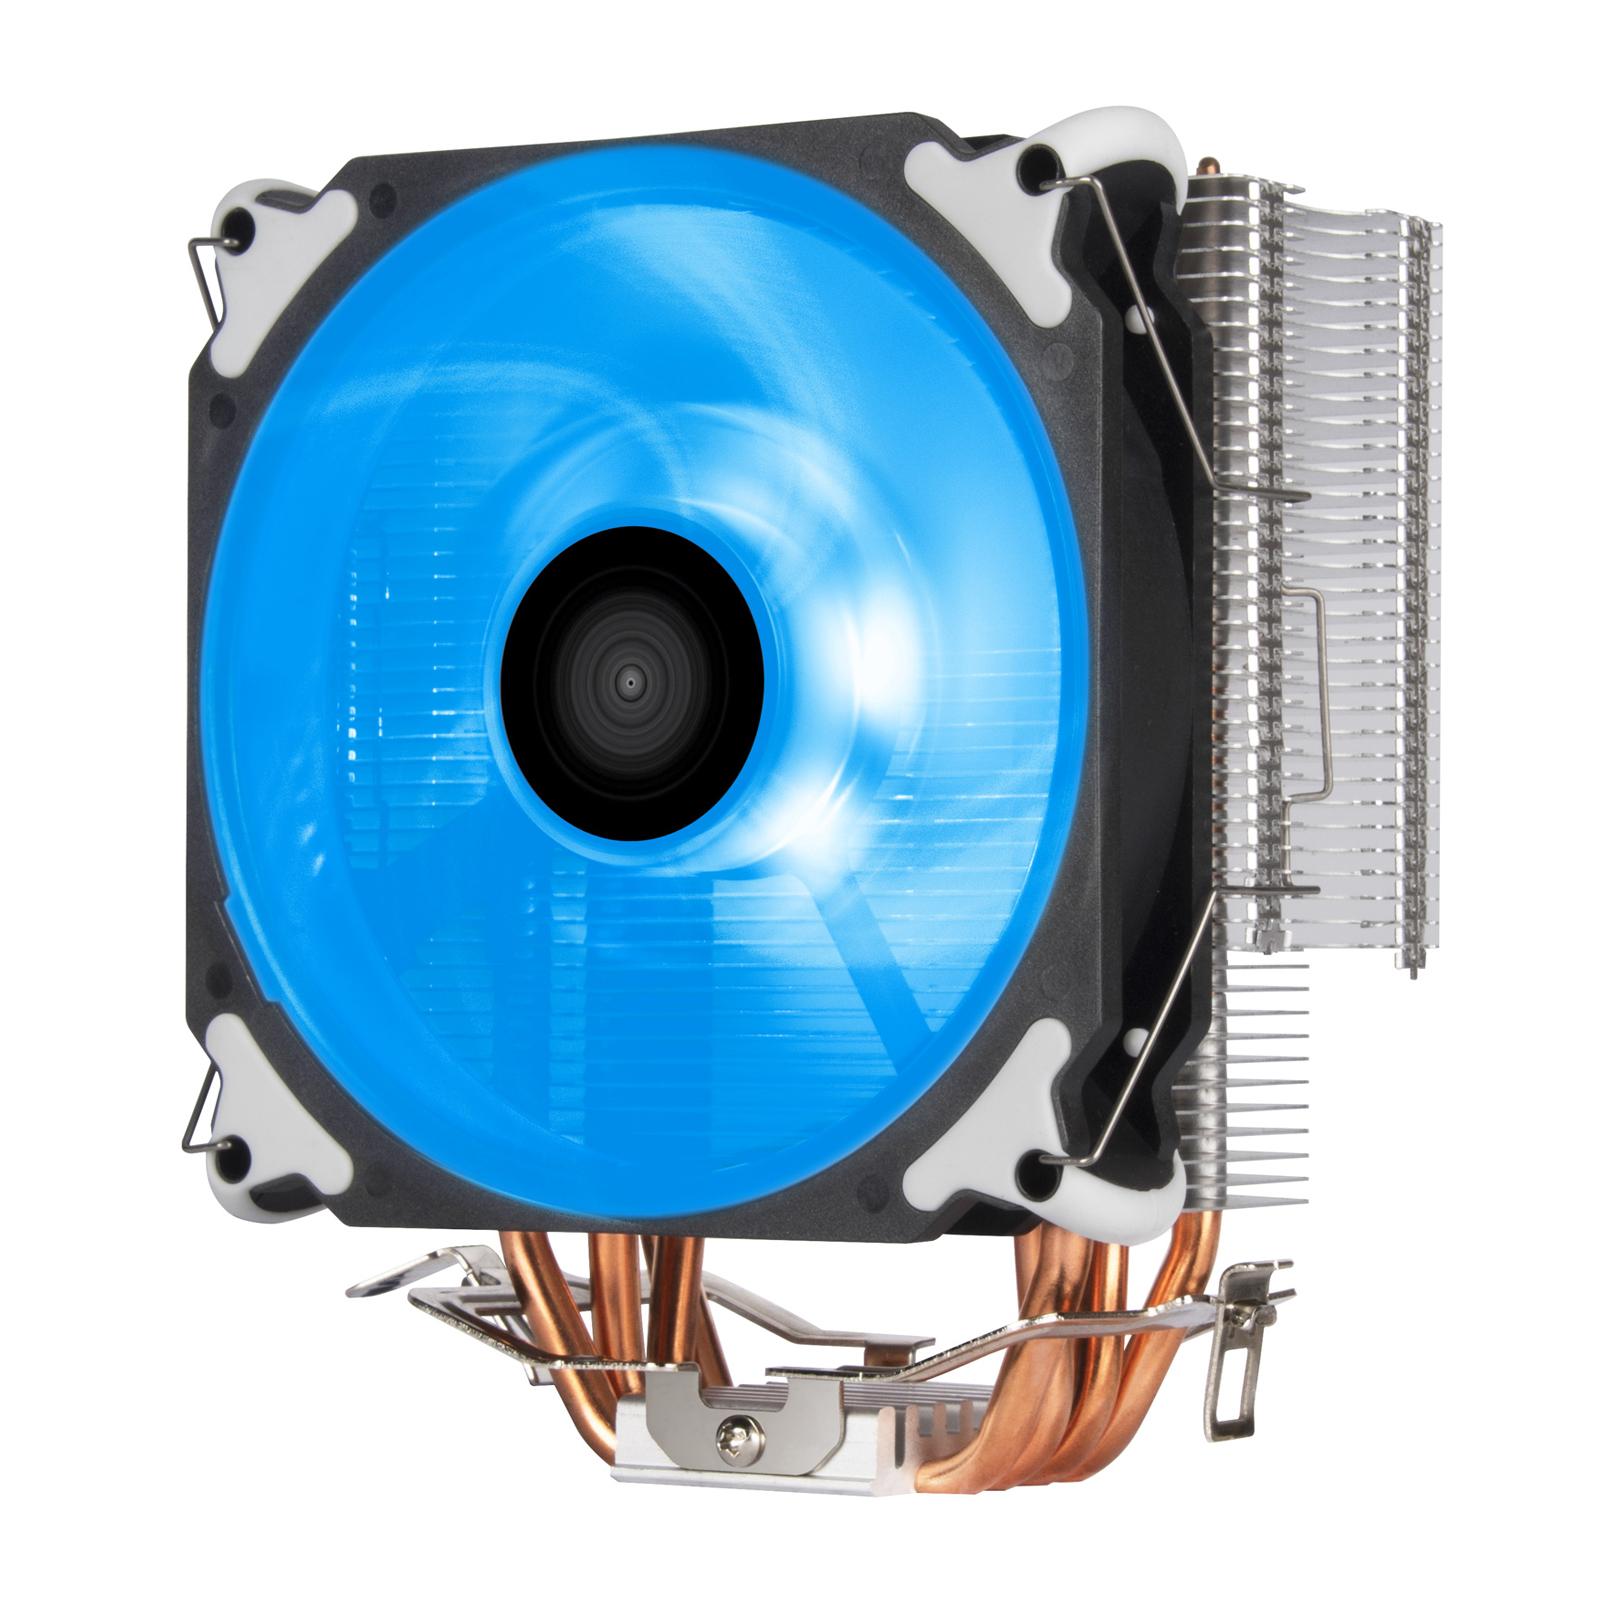 SilverStone AR12 RGB CPU Cooler